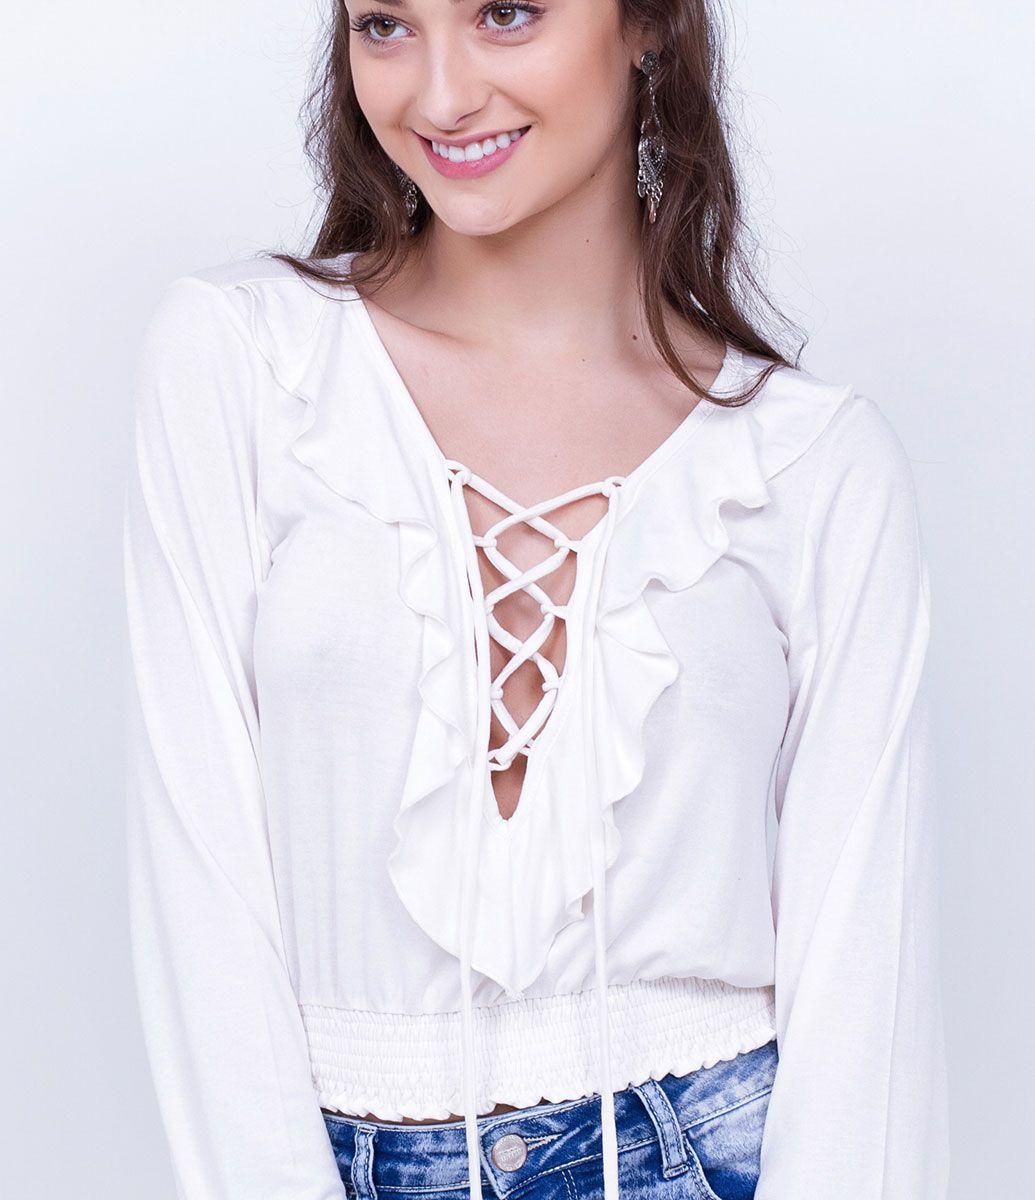 Blusa Feminina Modelo Cropped Manga Longa Decote Ombro A Ombro